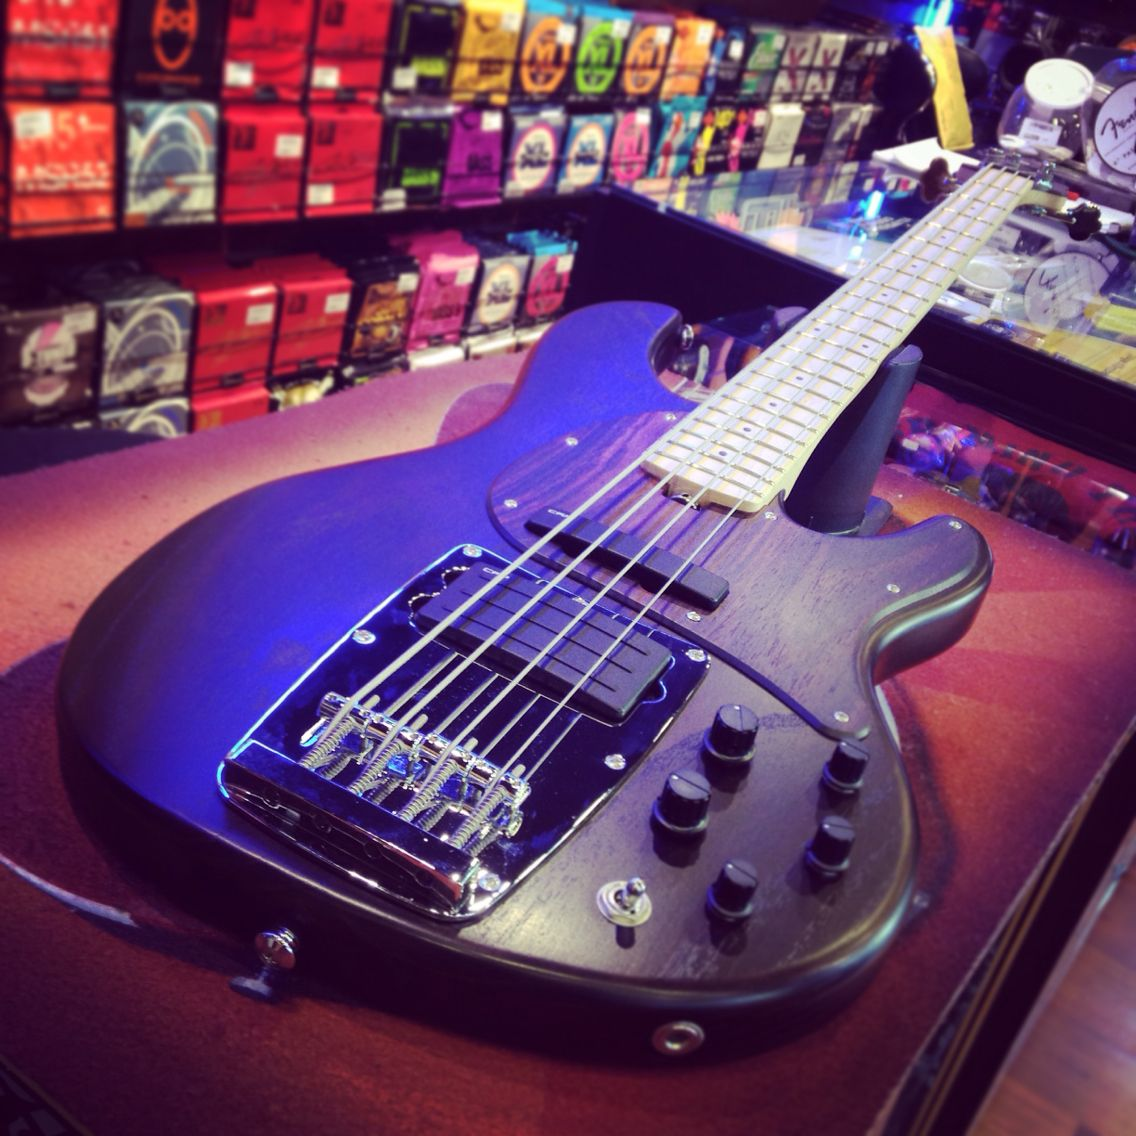 Ibanez ATK 800 Premium SOLD! Bye bye!  #ibanez #ibanezbass #atk #atk800 #weplaybass #bassline #bassguitar